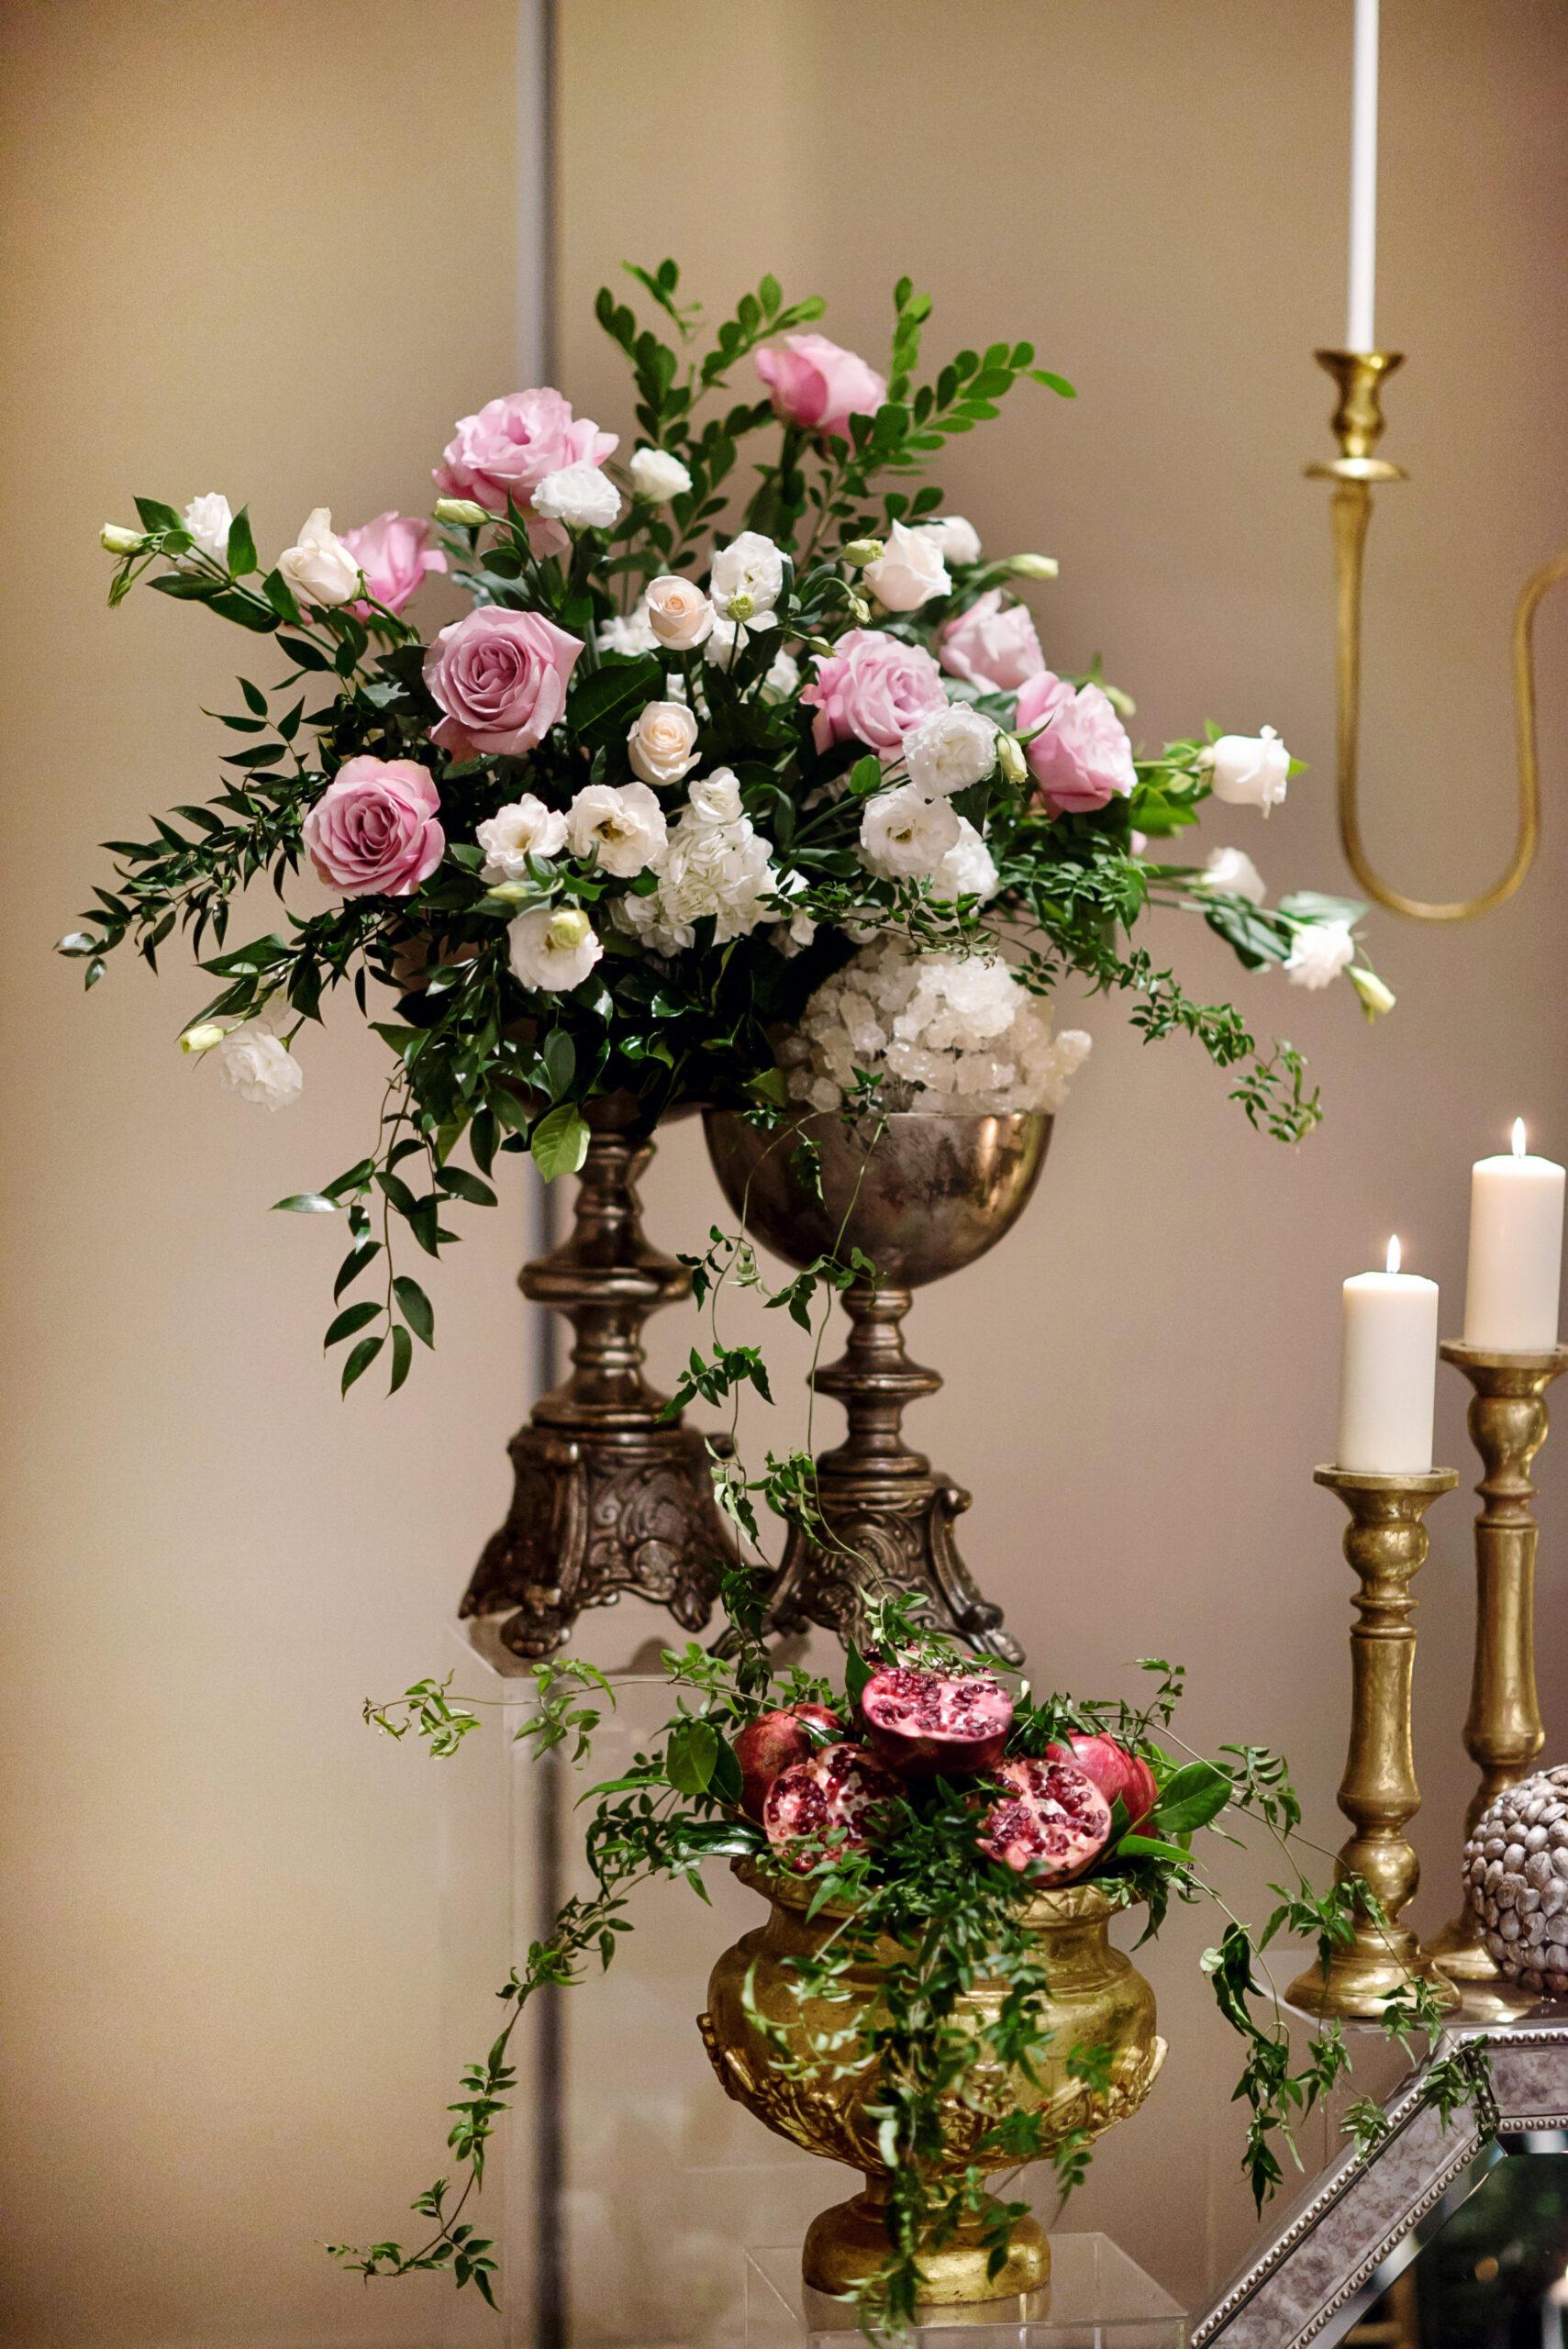 https://secureservercdn.net/45.40.145.151/kgq.ab5.myftpupload.com/wp-content/uploads/2020/04/Sanam-Soroush-s-Wedding-wedluxe-submission-0043-scaled.jpg?time=1627956768